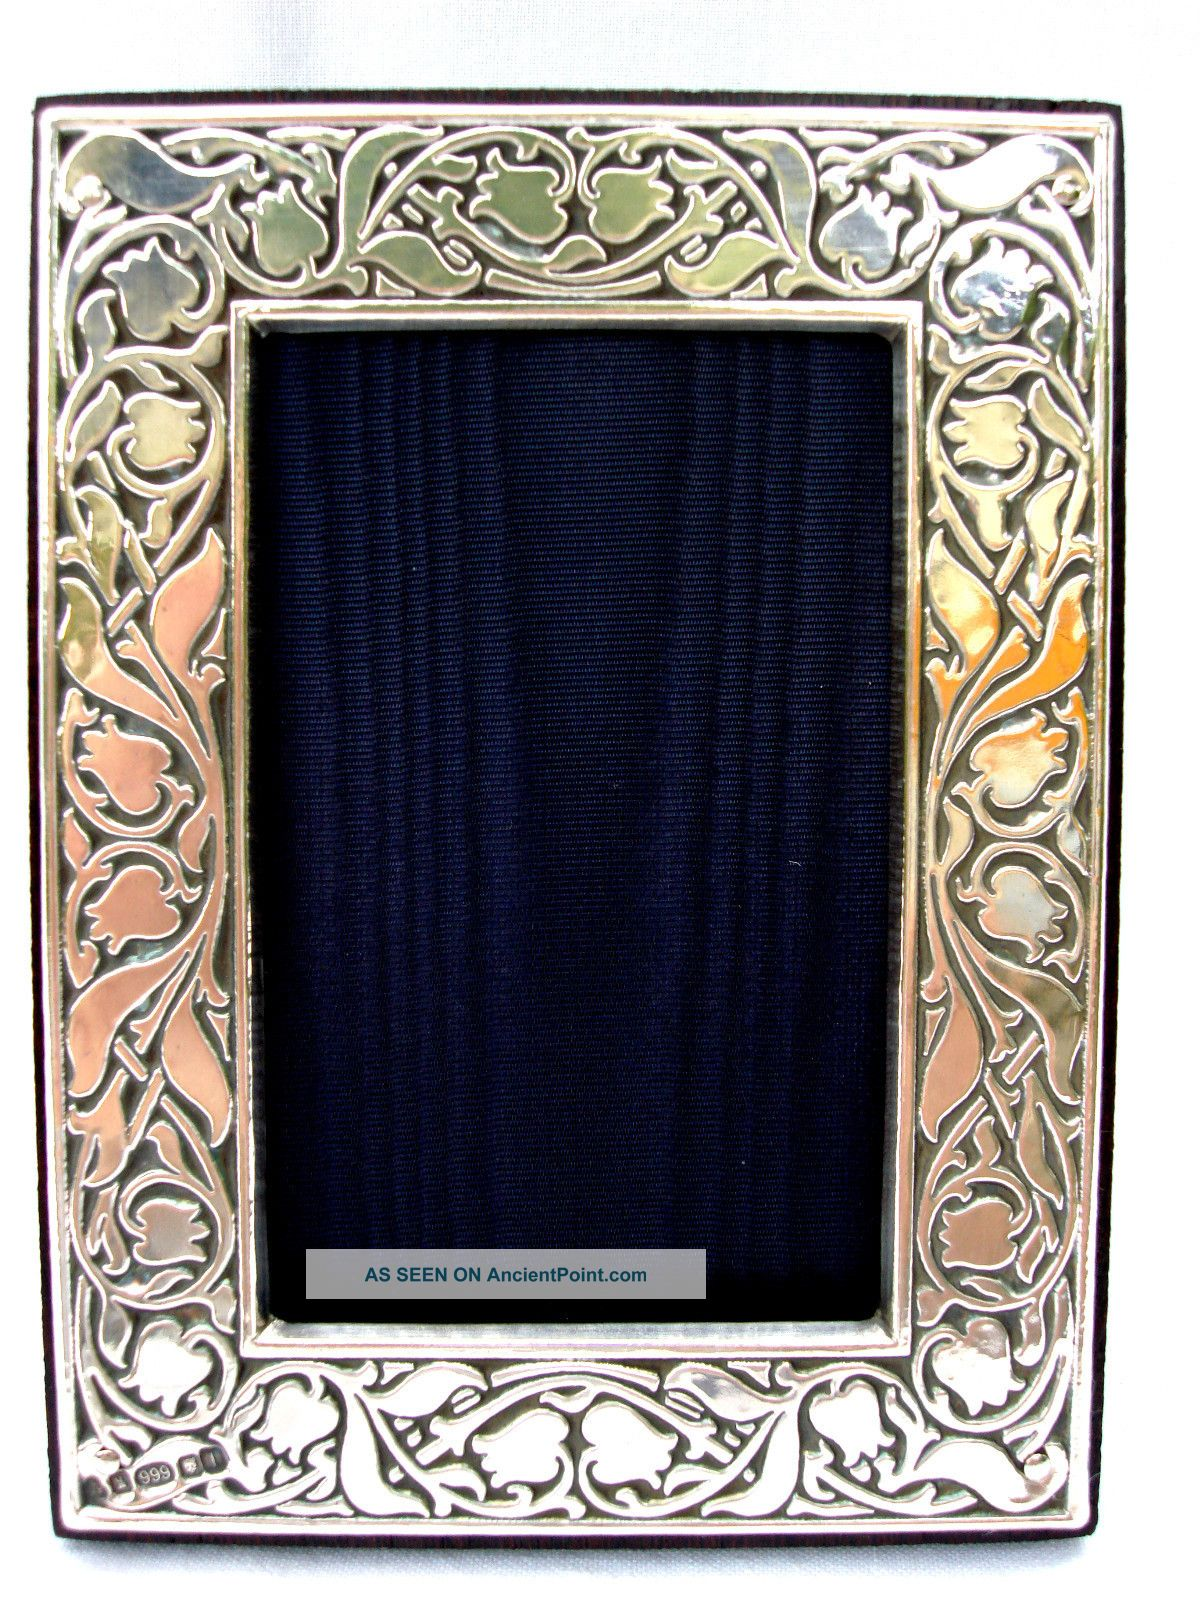 Finest Quality Silver 999 London Hallmarked Photo Frame Frames photo